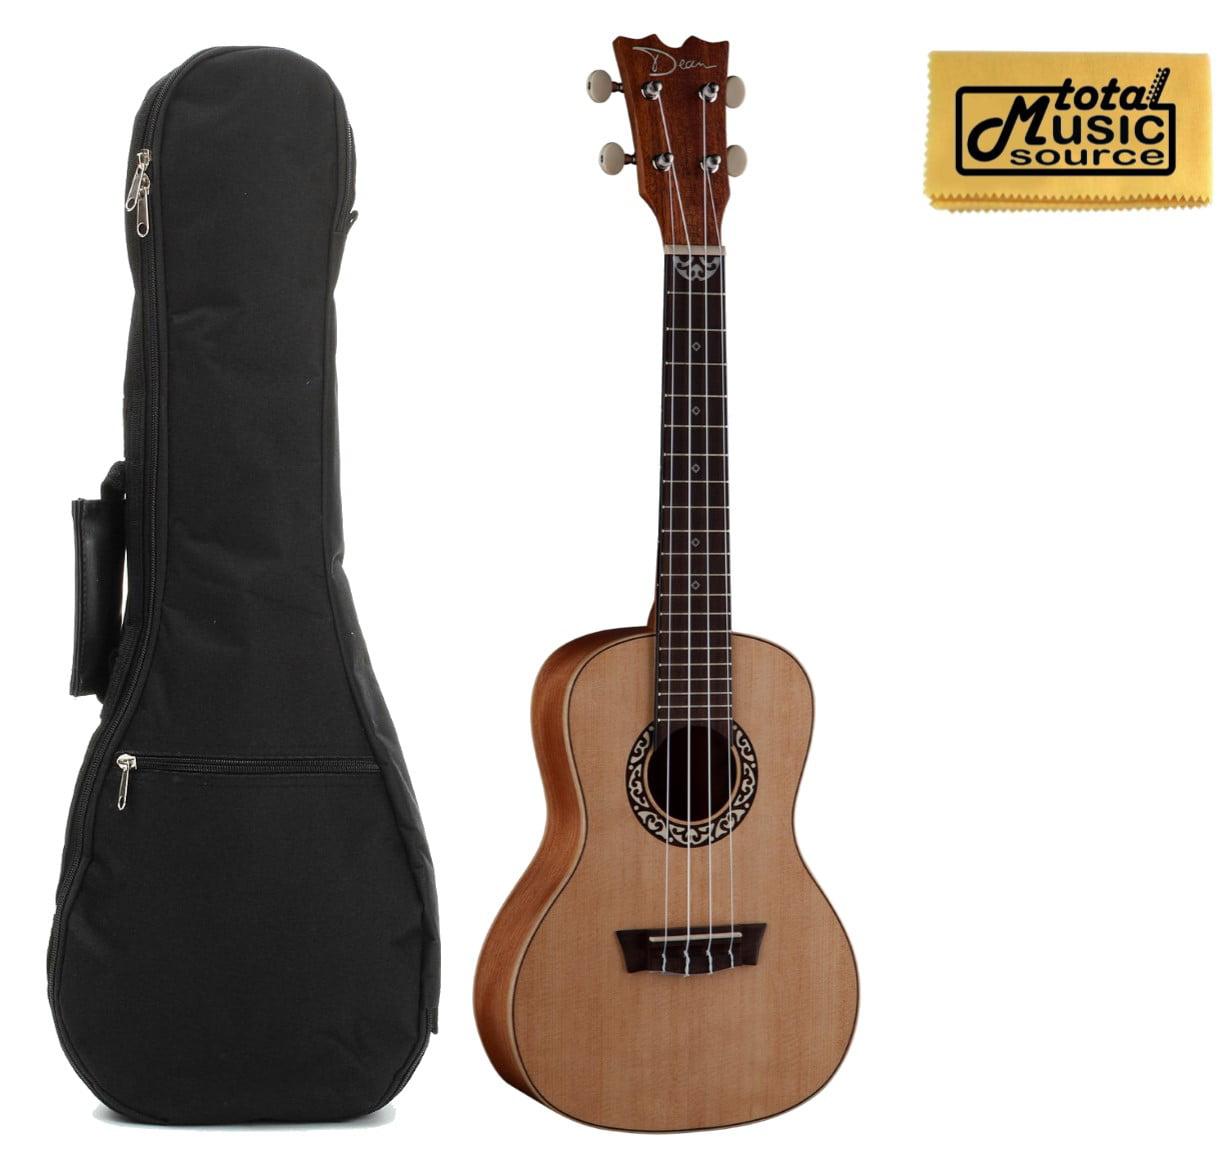 Dean Guitars Concert Spruce Ukulele, Satin Natural w/Padded Gigbag & PC ,UKEDCSPR BAGPC